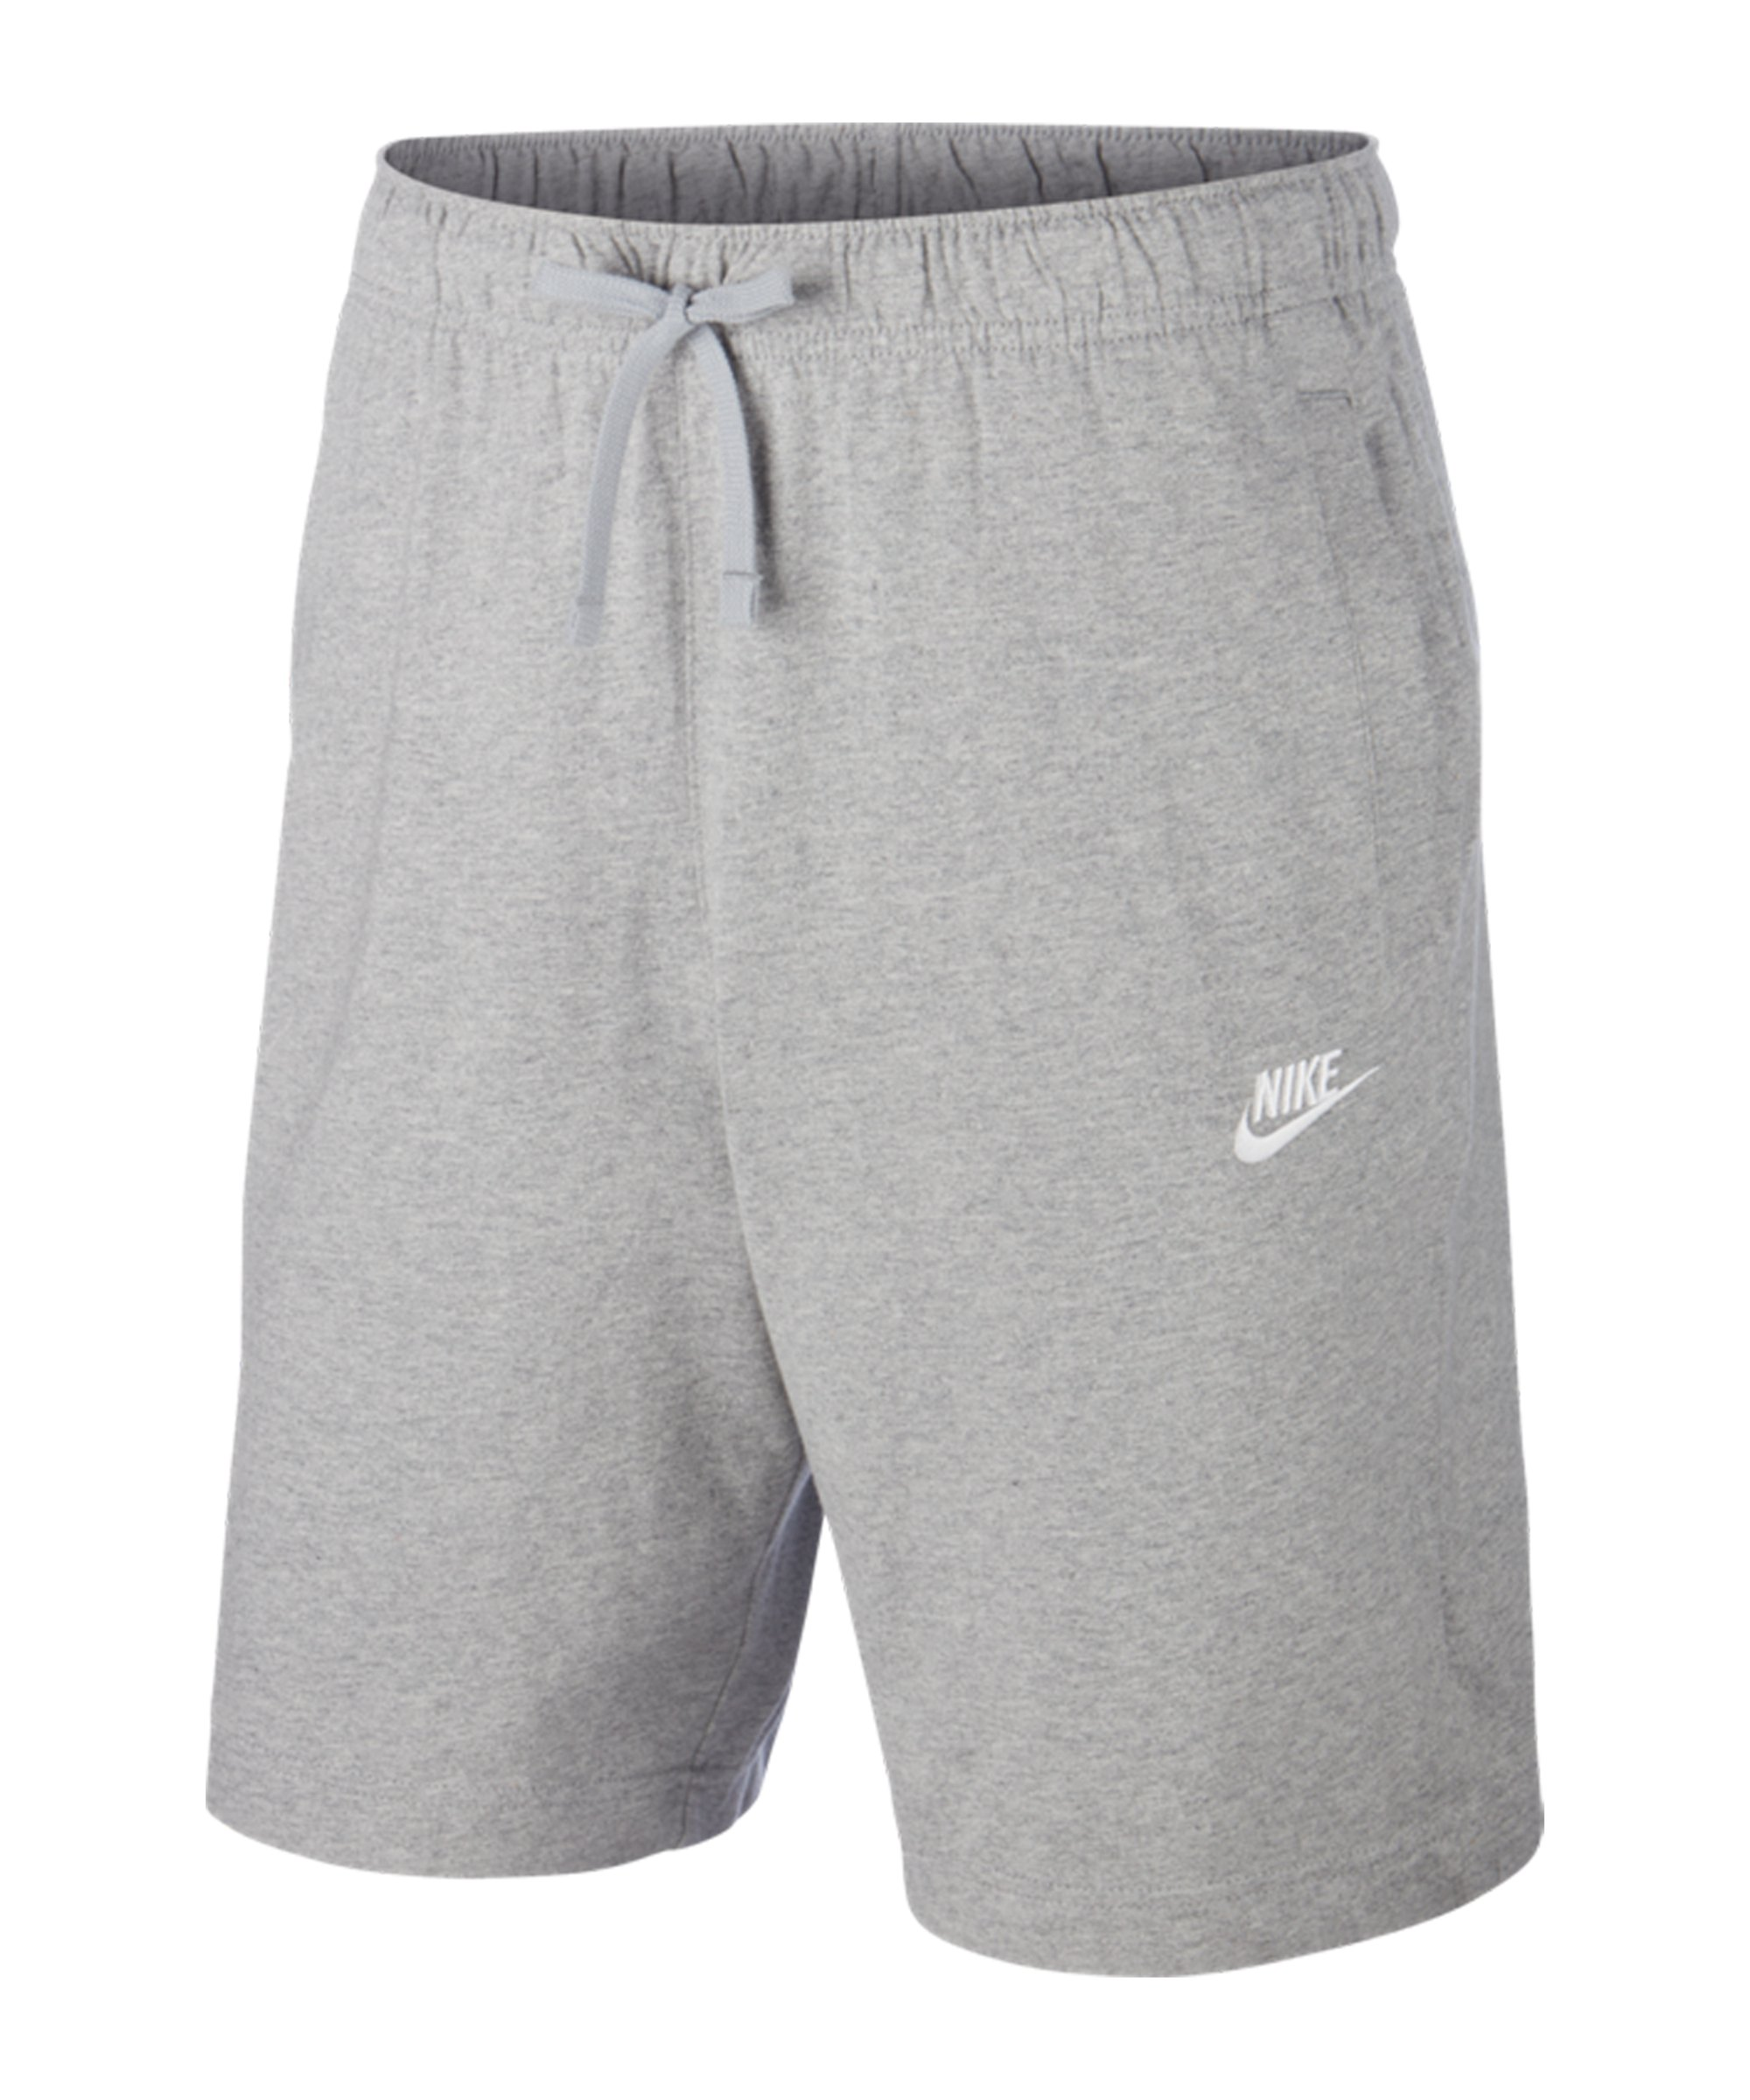 Nike Club Jersey Short Grau Weiss F063 - grau